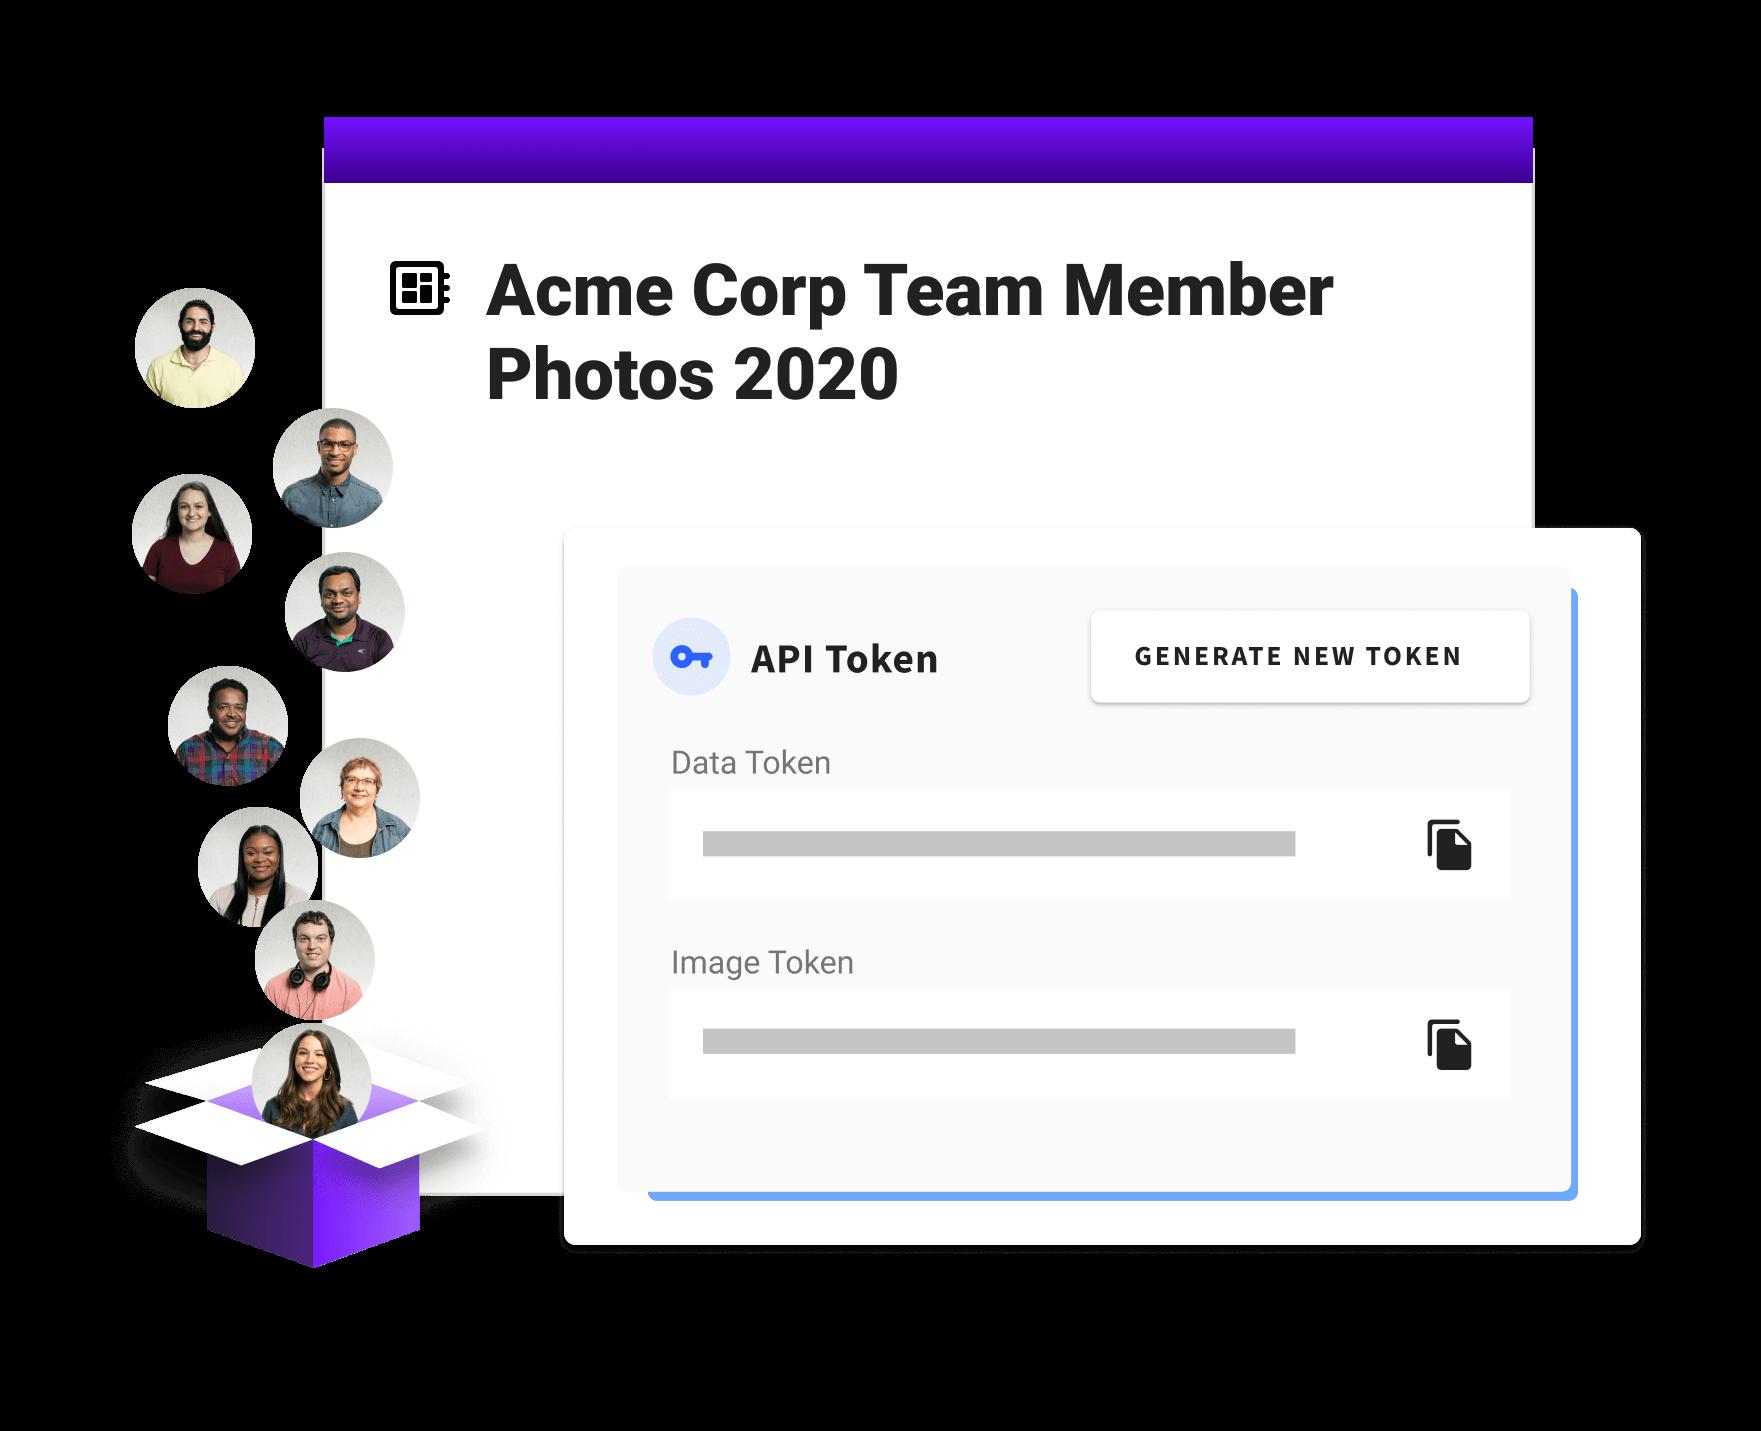 API token gathering profile photos